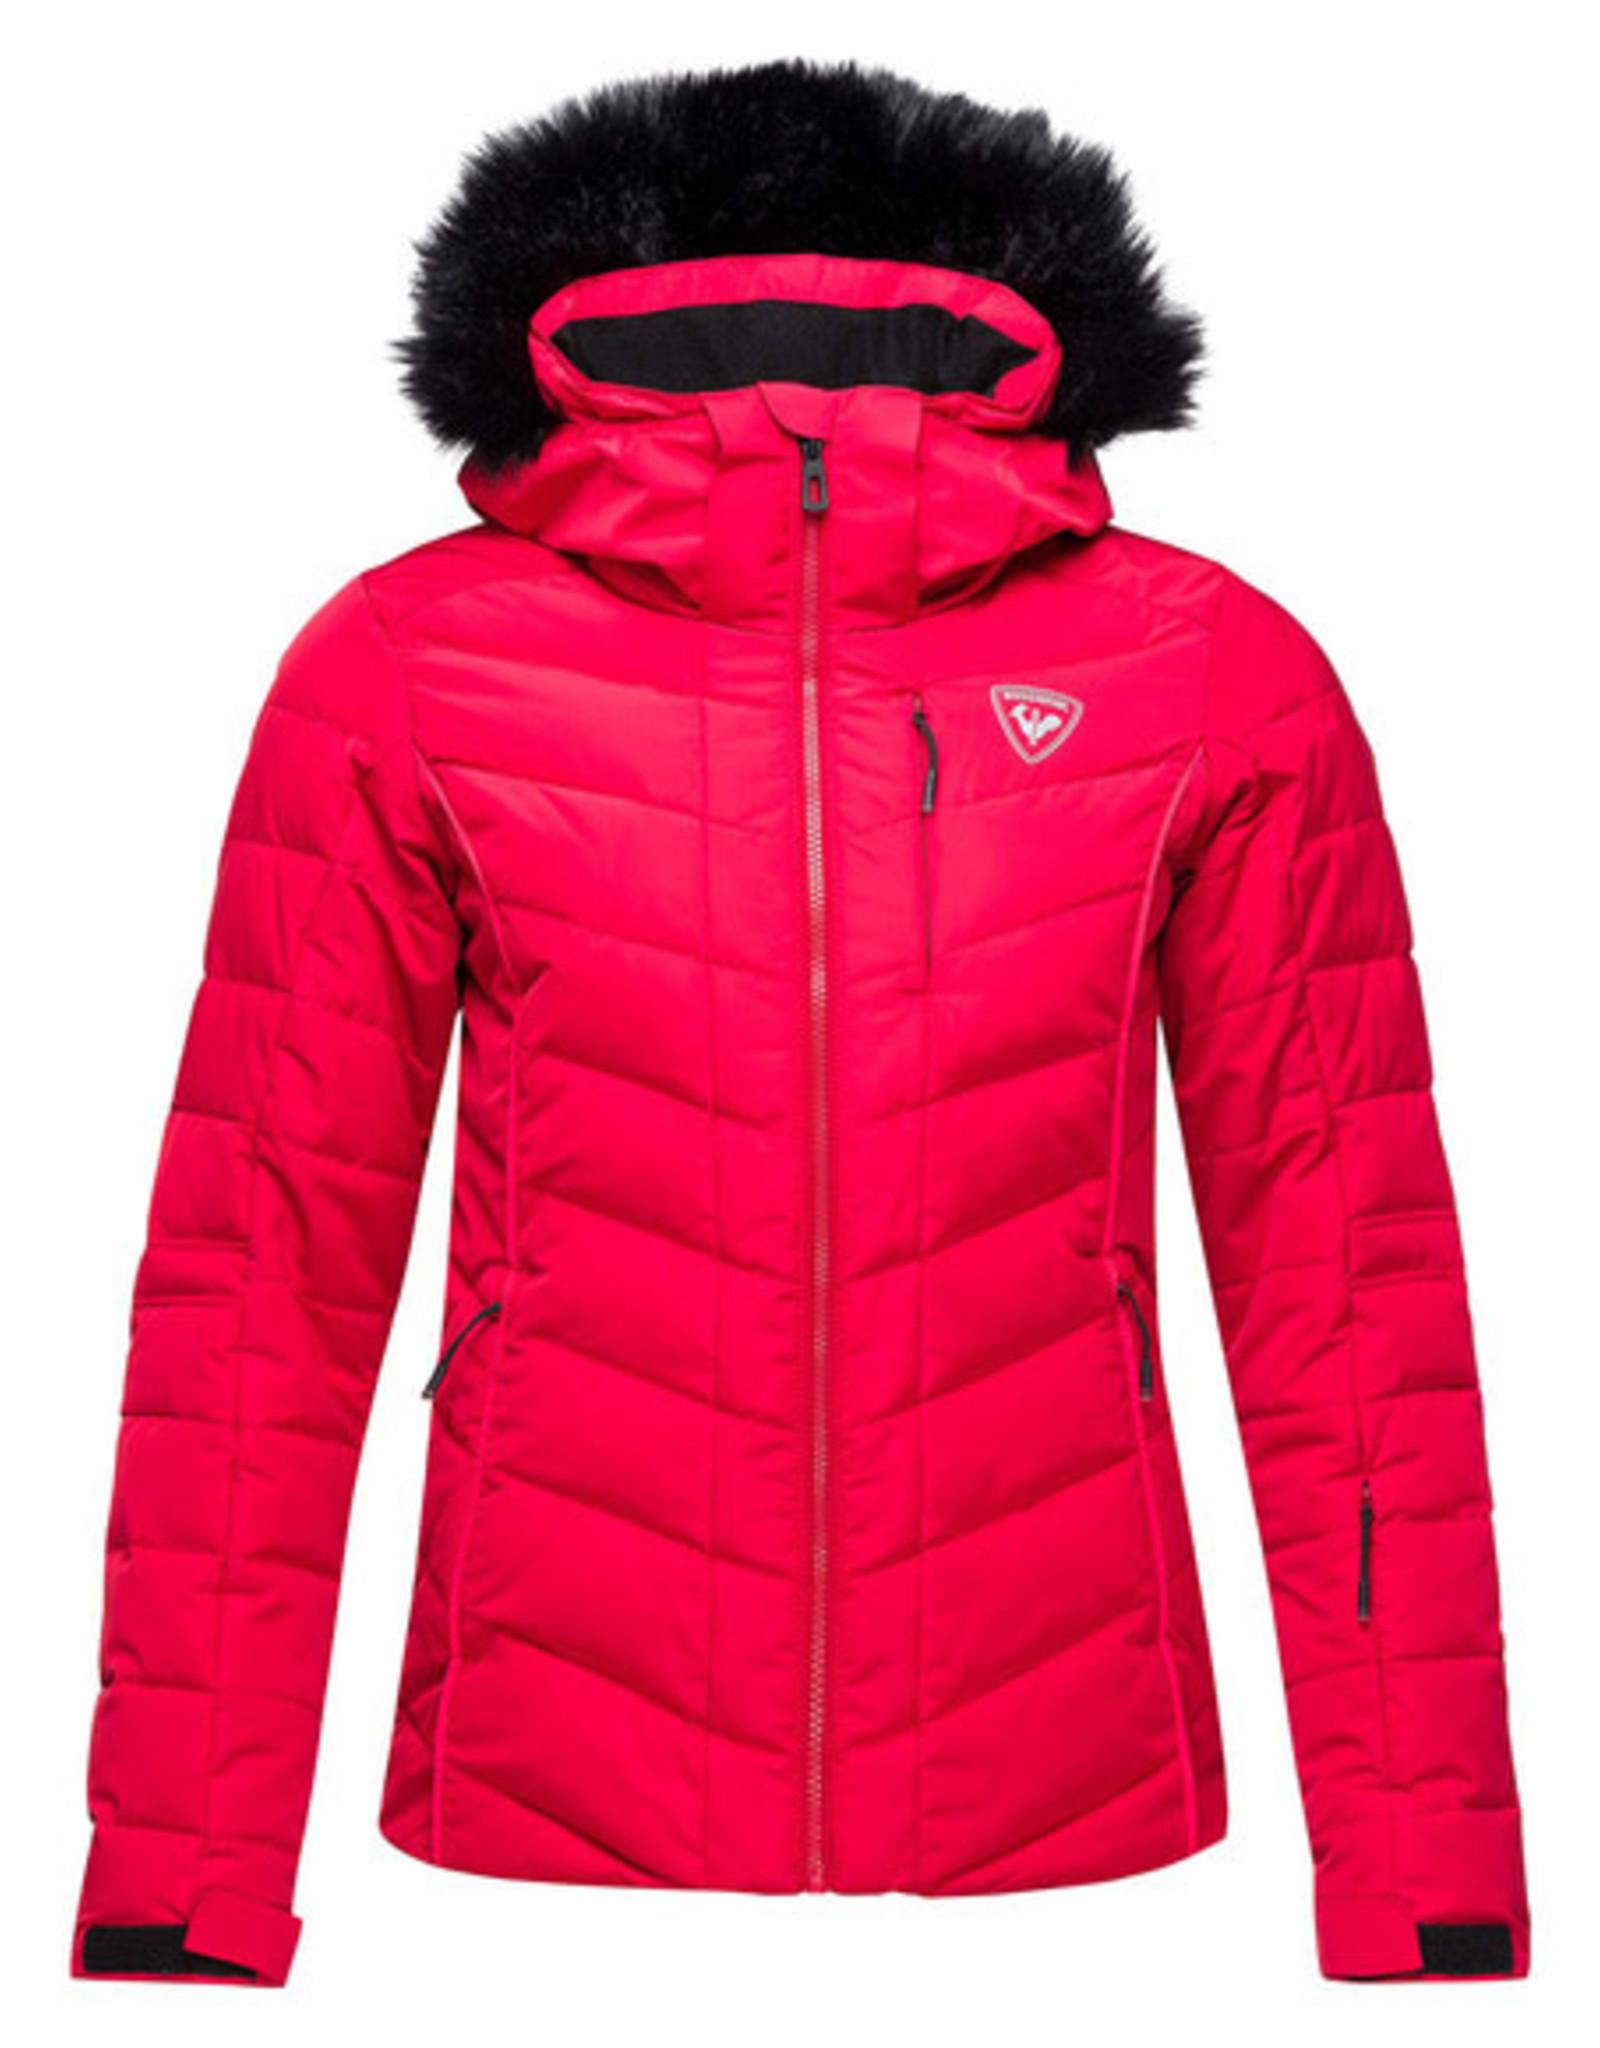 ROSSIGNOL Rossignol Women's Rapide Pearly Jacket Carmin